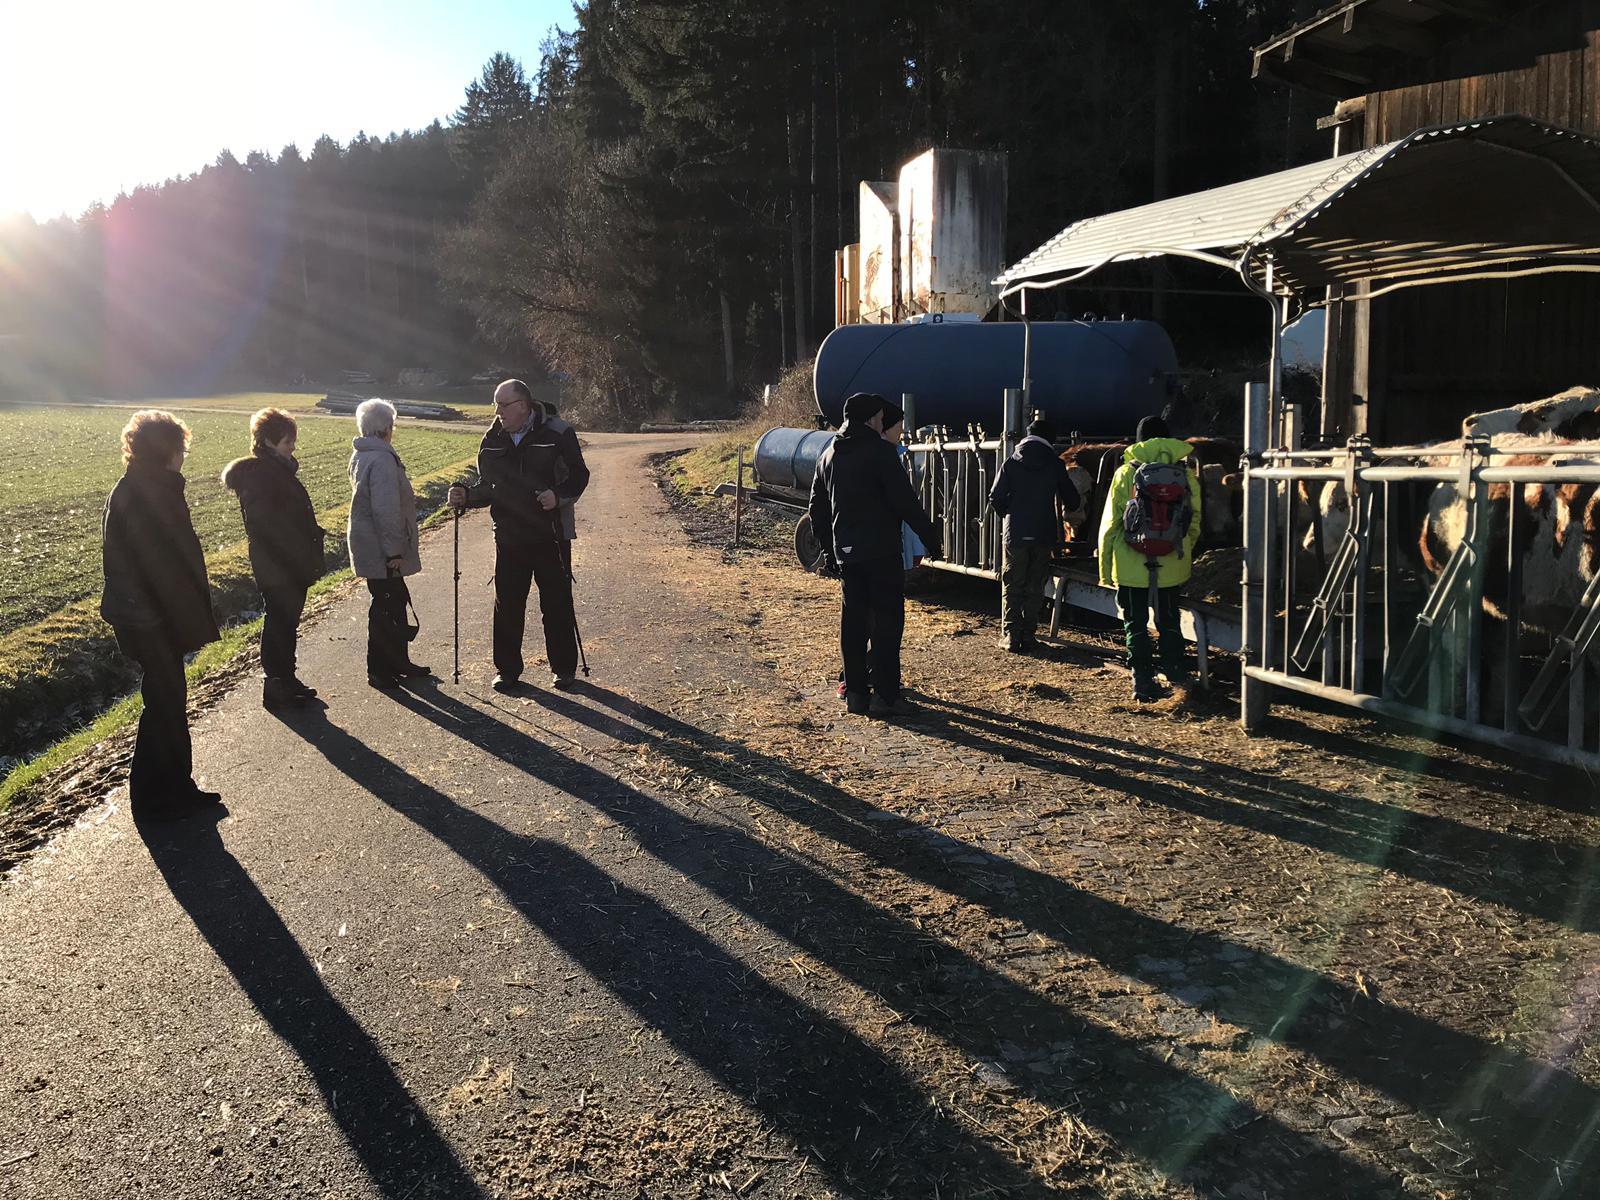 2018-12-28_Wanderung (6)